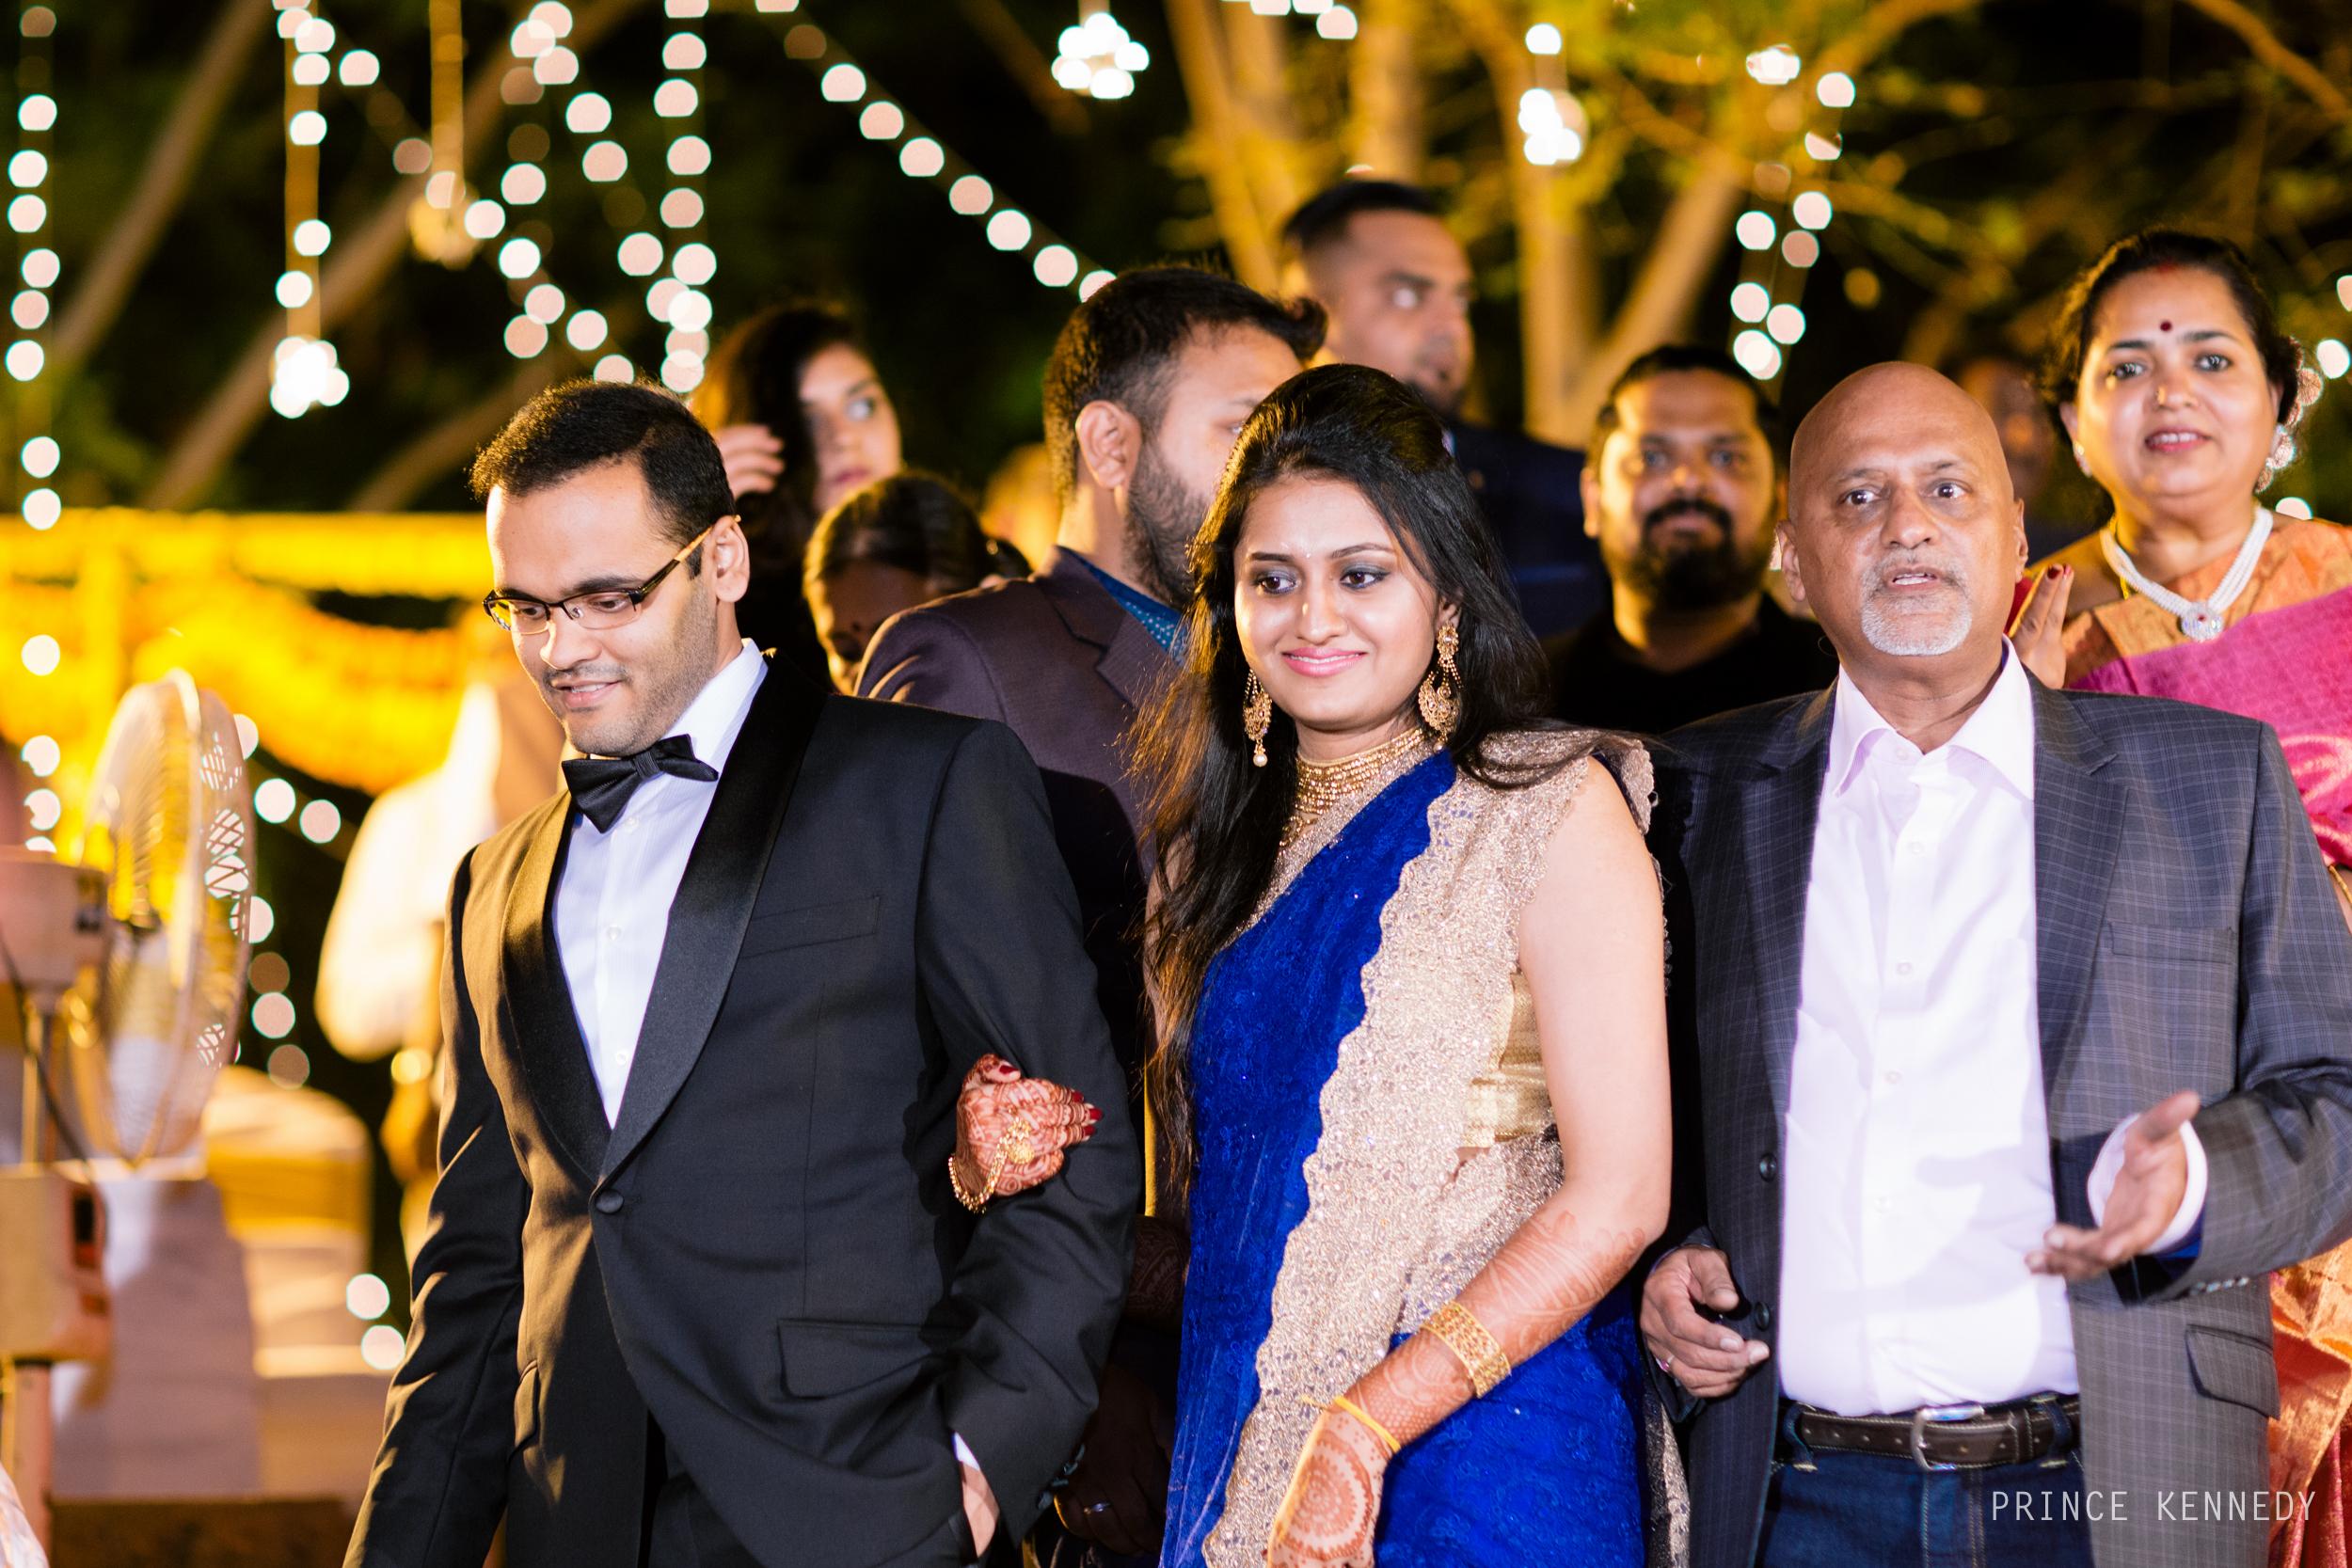 Athmajja-Nithesh-Engagement-Couple-Portrait-Portraiture-Wedding-Couple-Portrait-Chennai-Photographer-Candid-Photography-Destination-Best-Prince-Kennedy-Photography-80.jpg